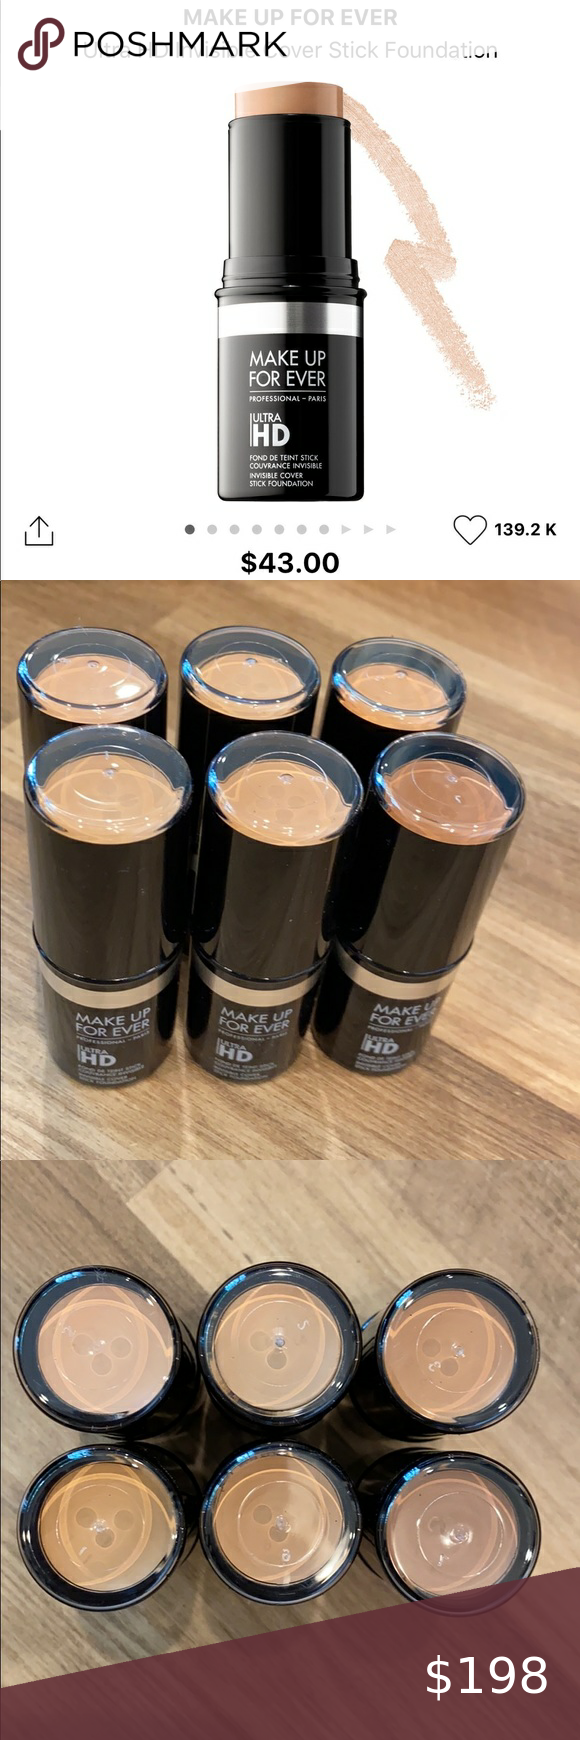 Makeup Forever HD Ultra Stick Foundation Bundle in 2020